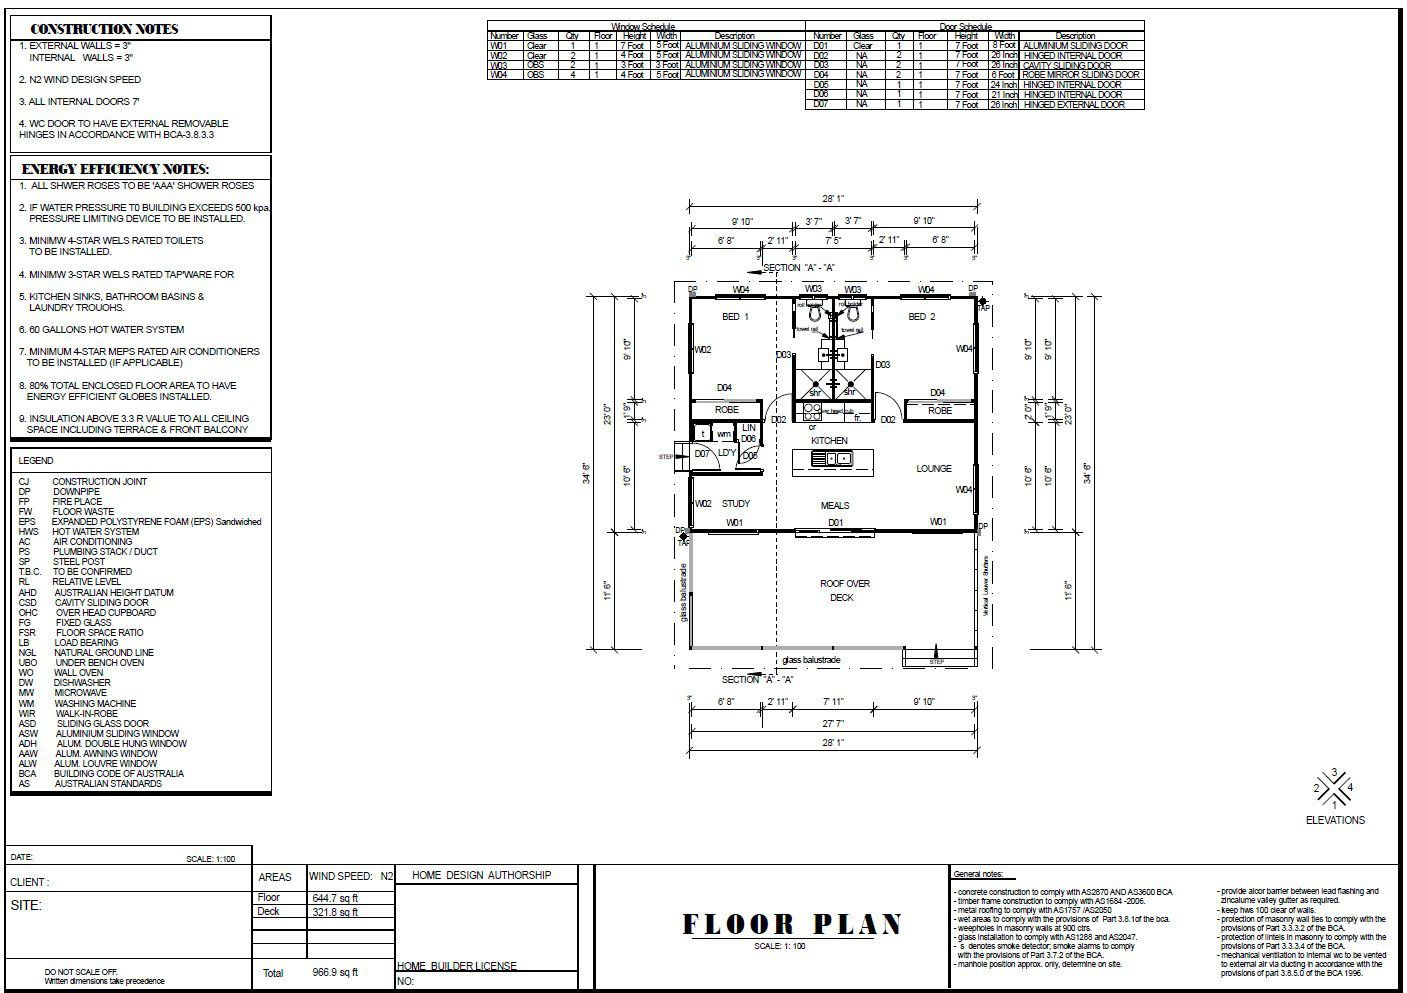 89 2 Bed Study Granny Flat Plans 89 8 M2 Preliminary House Plan Set Buy Here Australianfloorplans With Images Granny Flat Plans Flat Plan House Plans